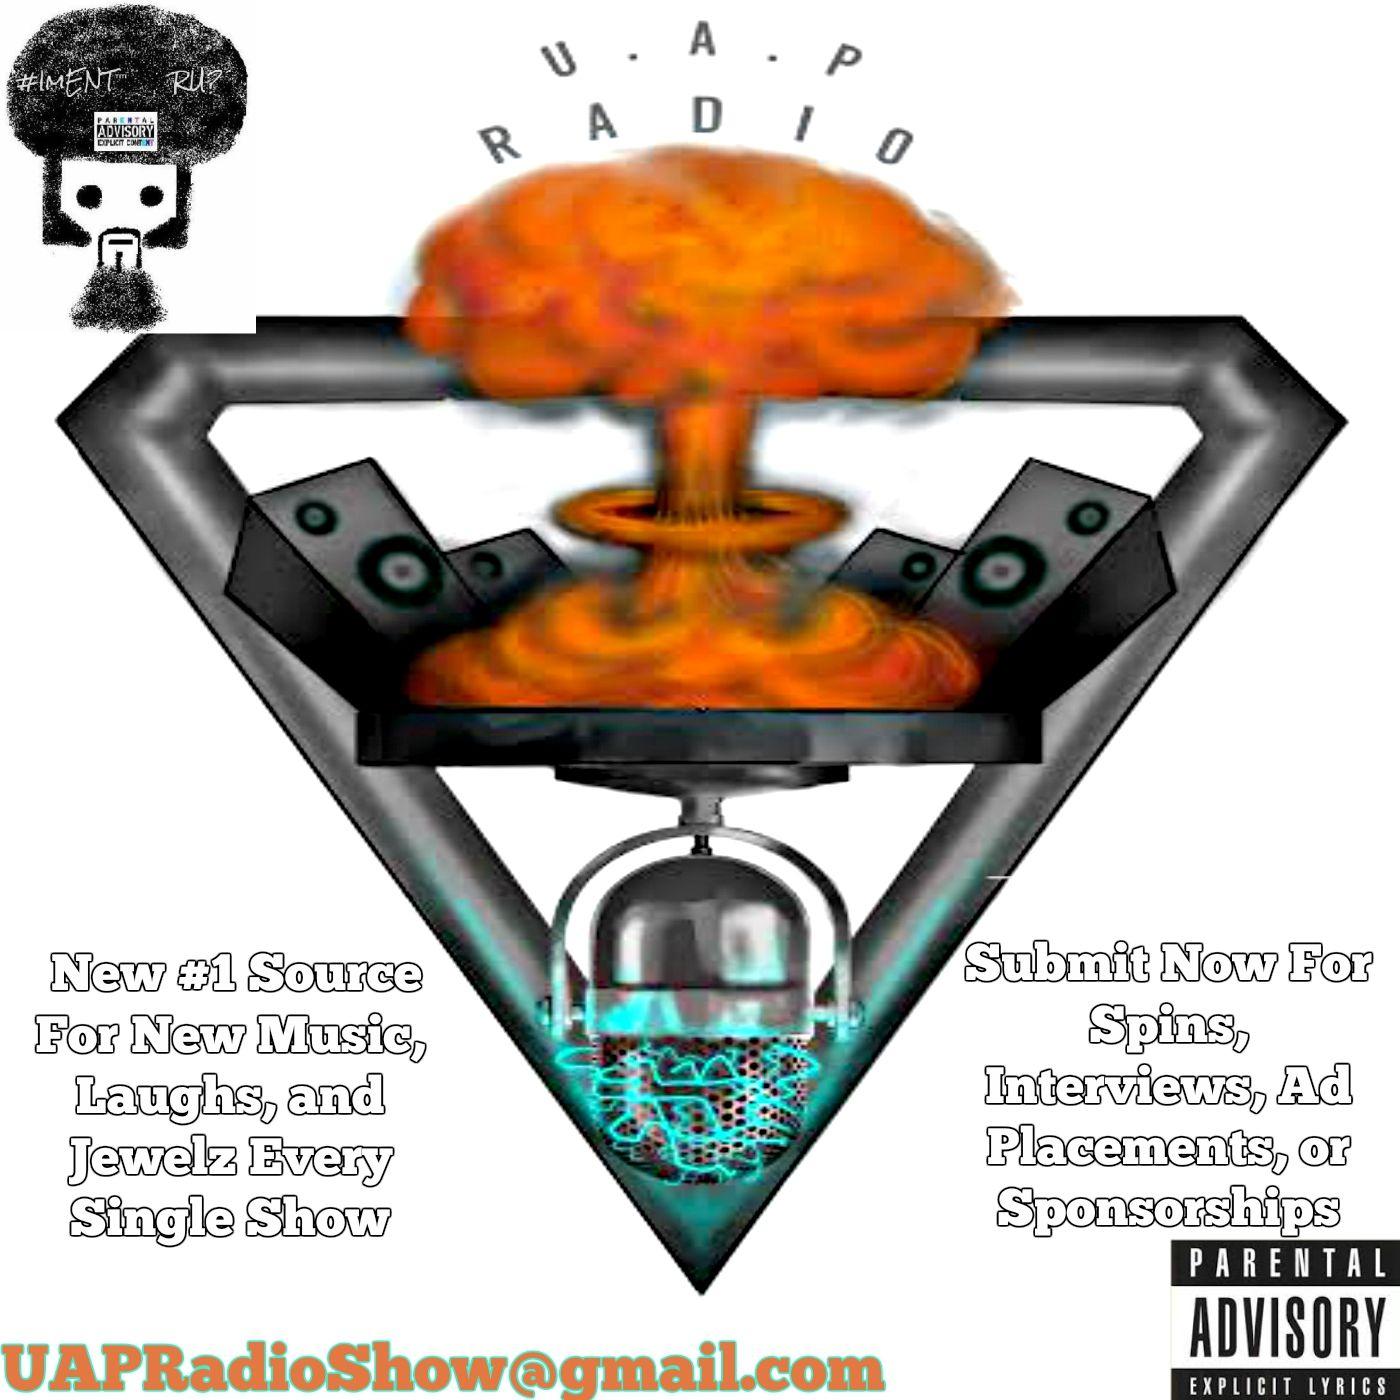 UAPRadioShow